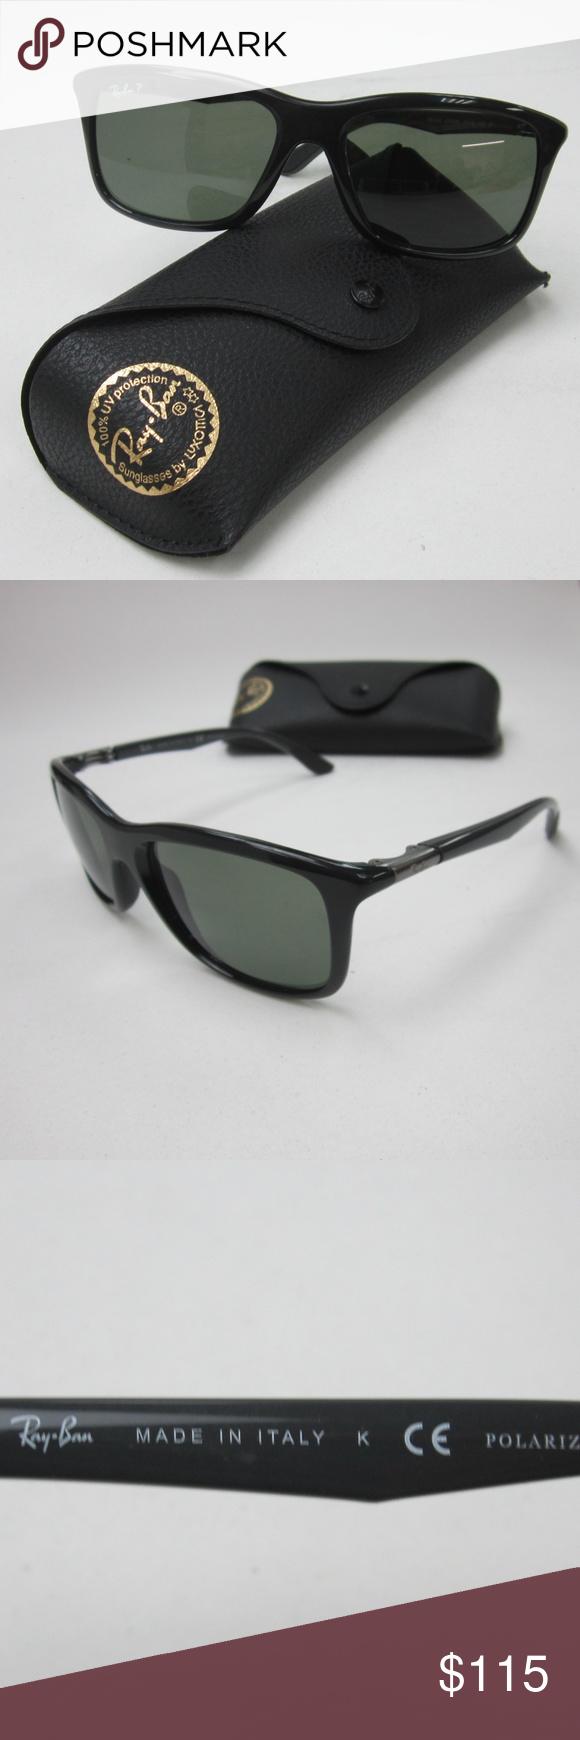 78b65cb070 RayBan RB 8352 Men s Sunglasses Polarized OLG527 RayBan RB 8352 6219 9A  Men s Sunglasses